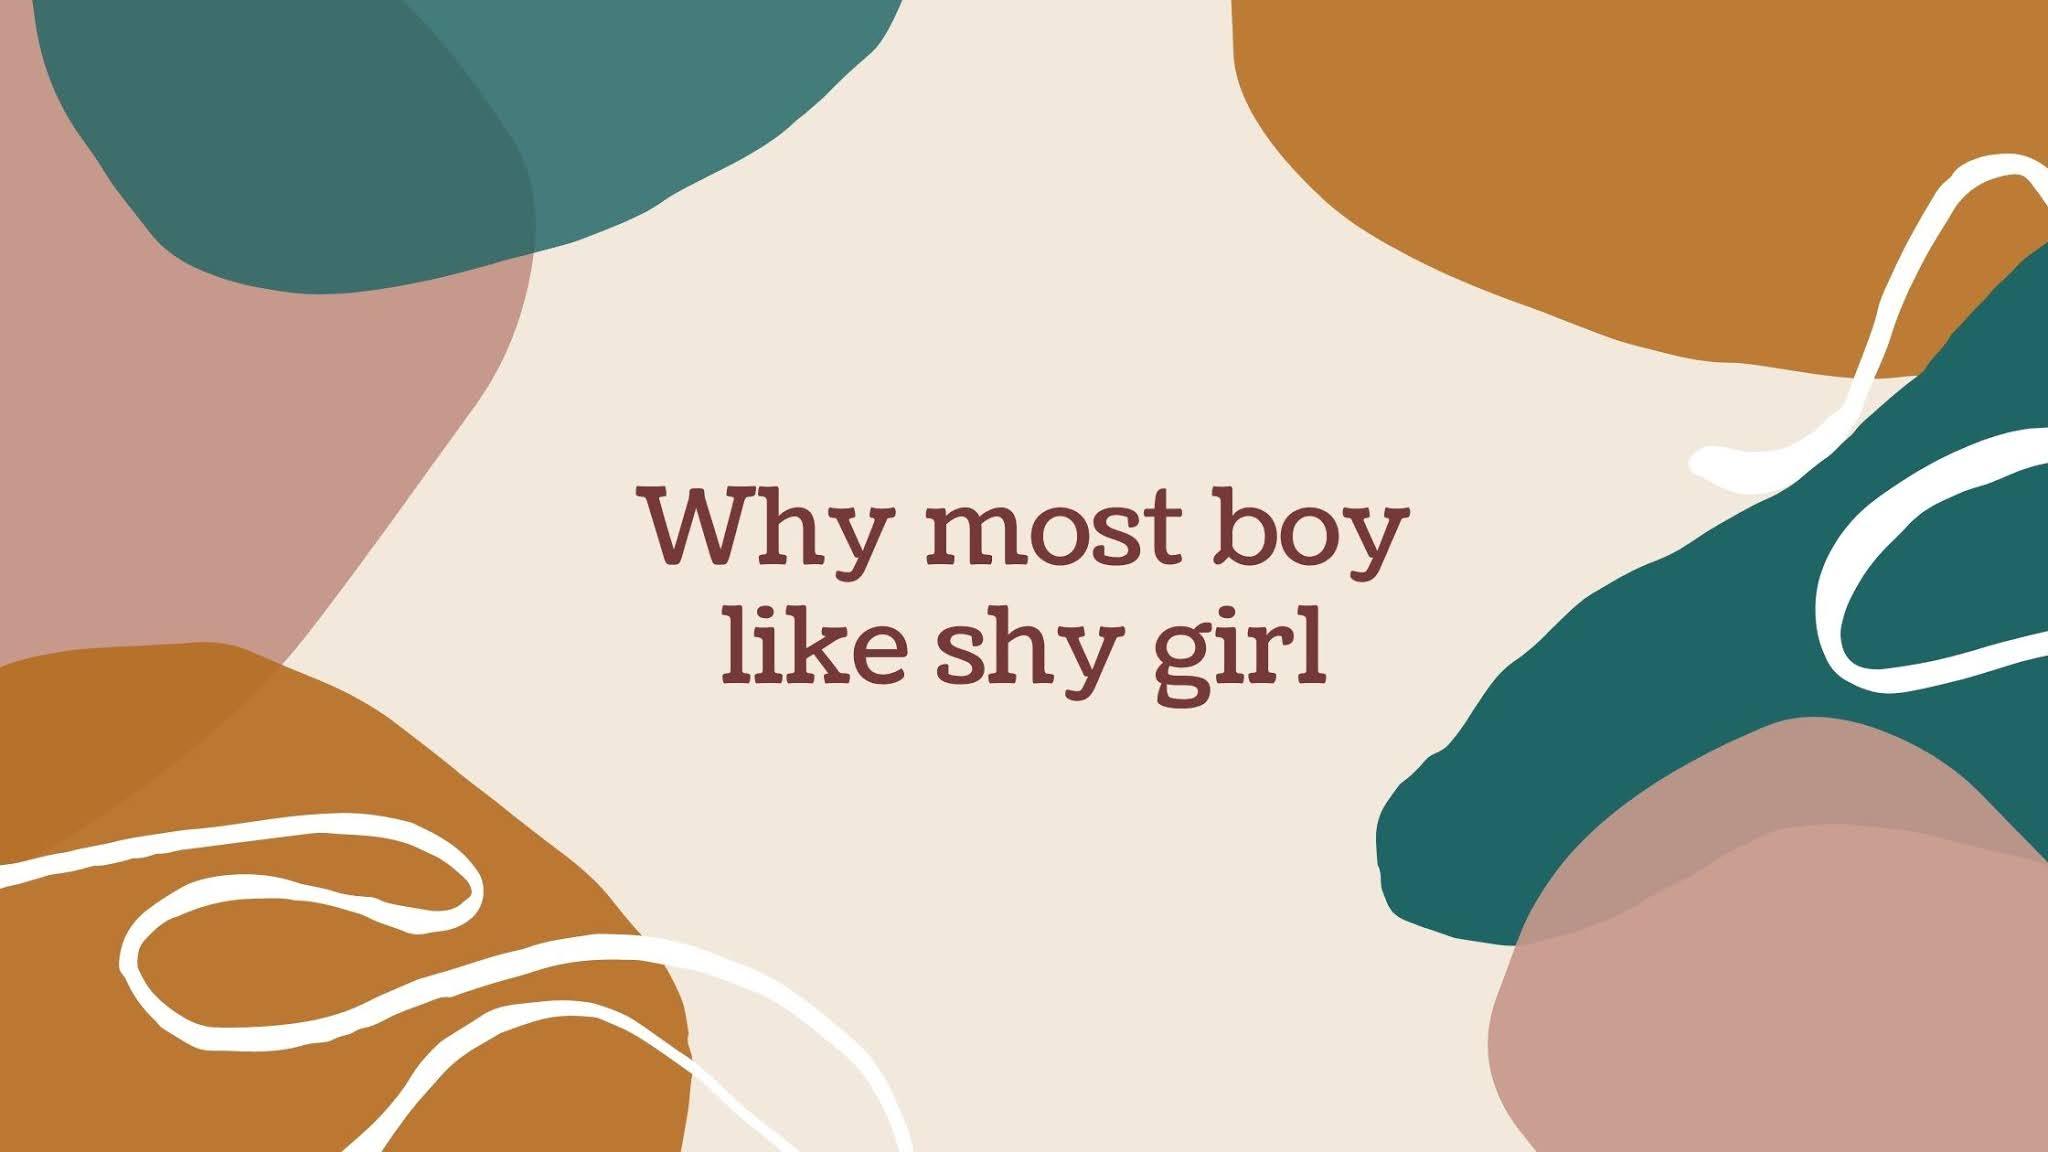 Why some like shy girl